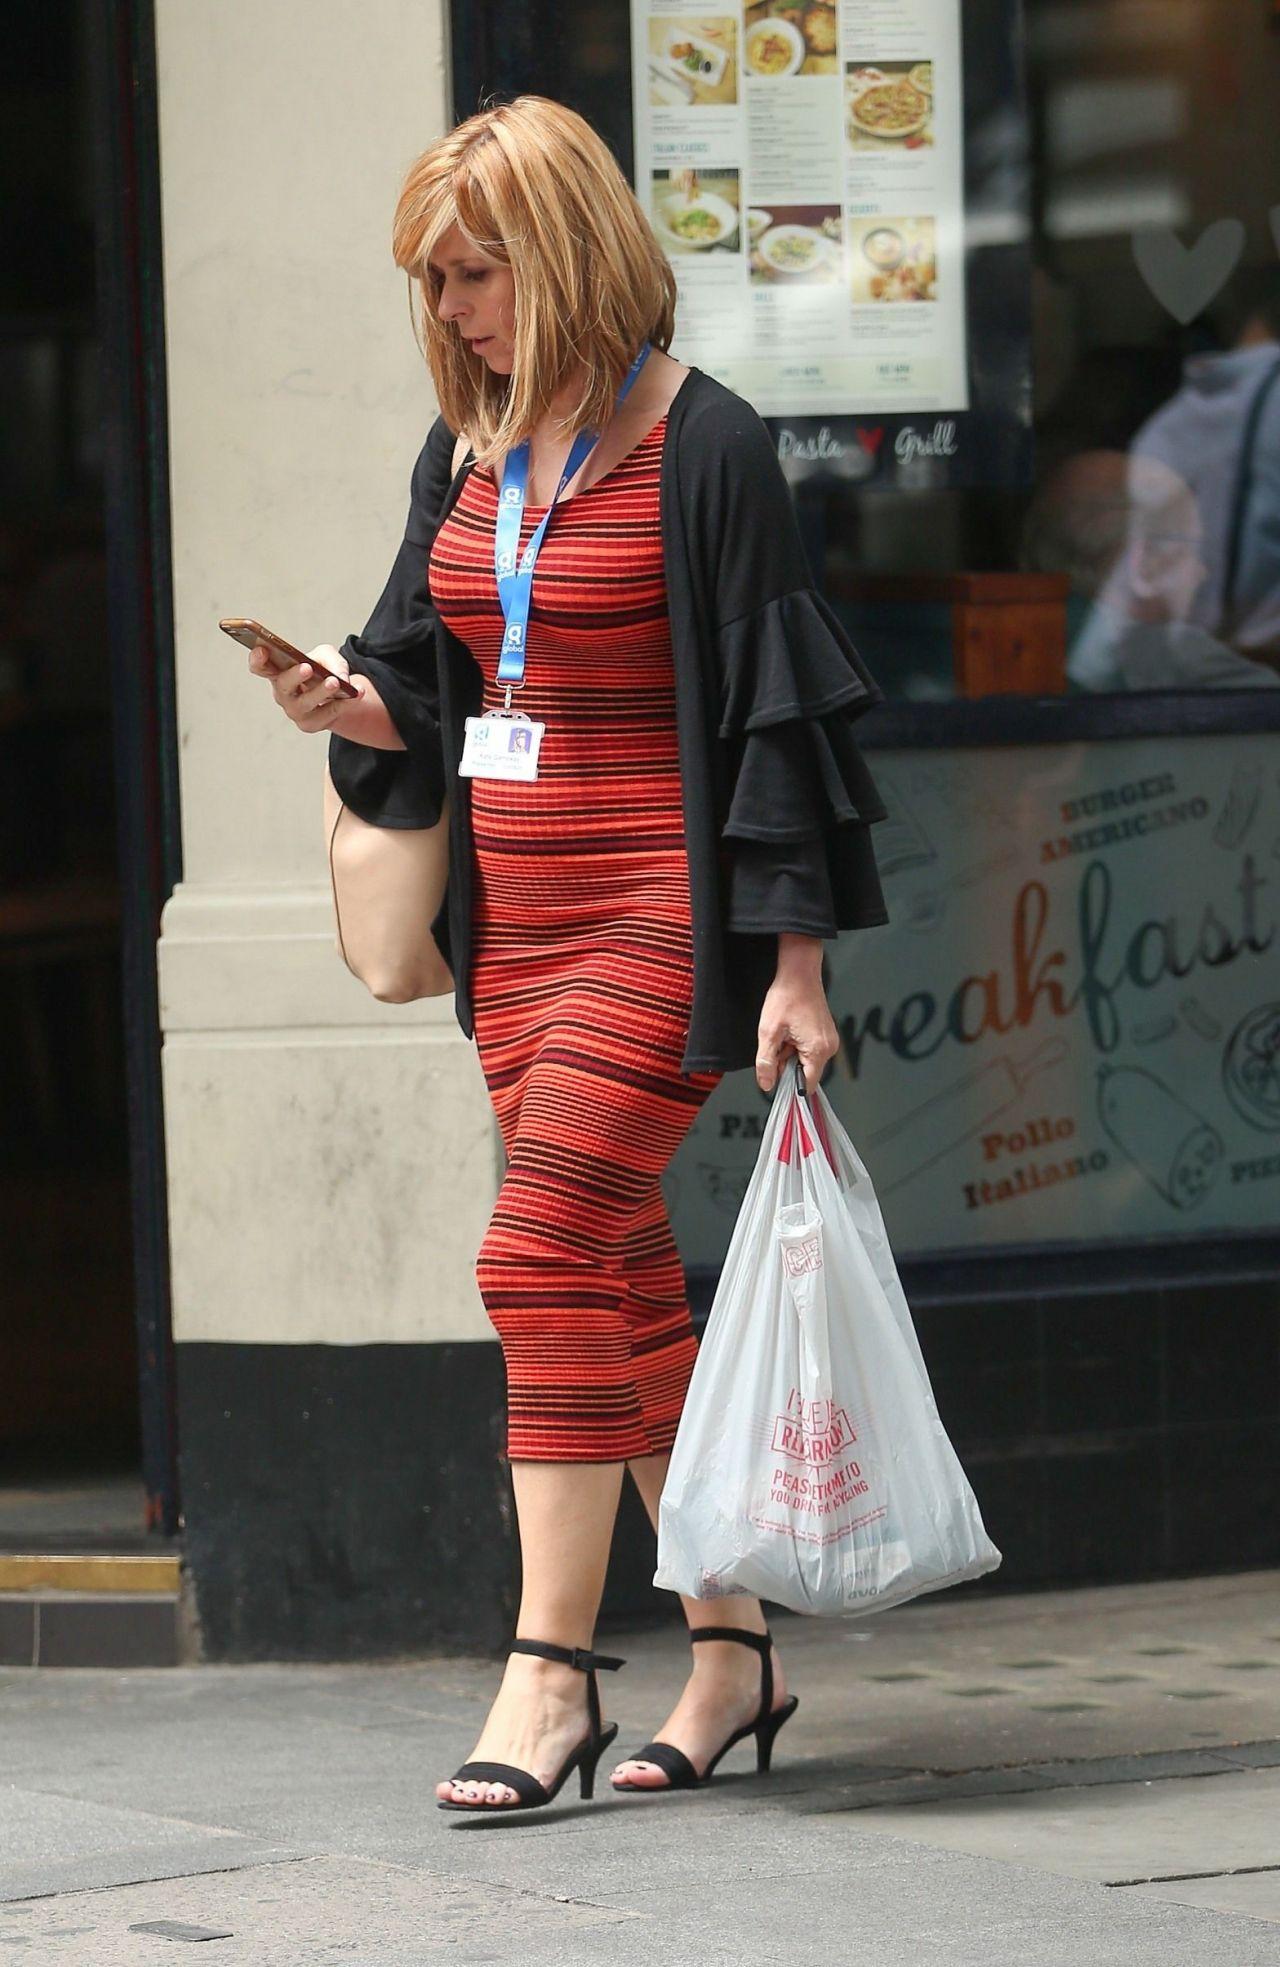 Kate Garraway In A Tight Fitting Striped Dress London